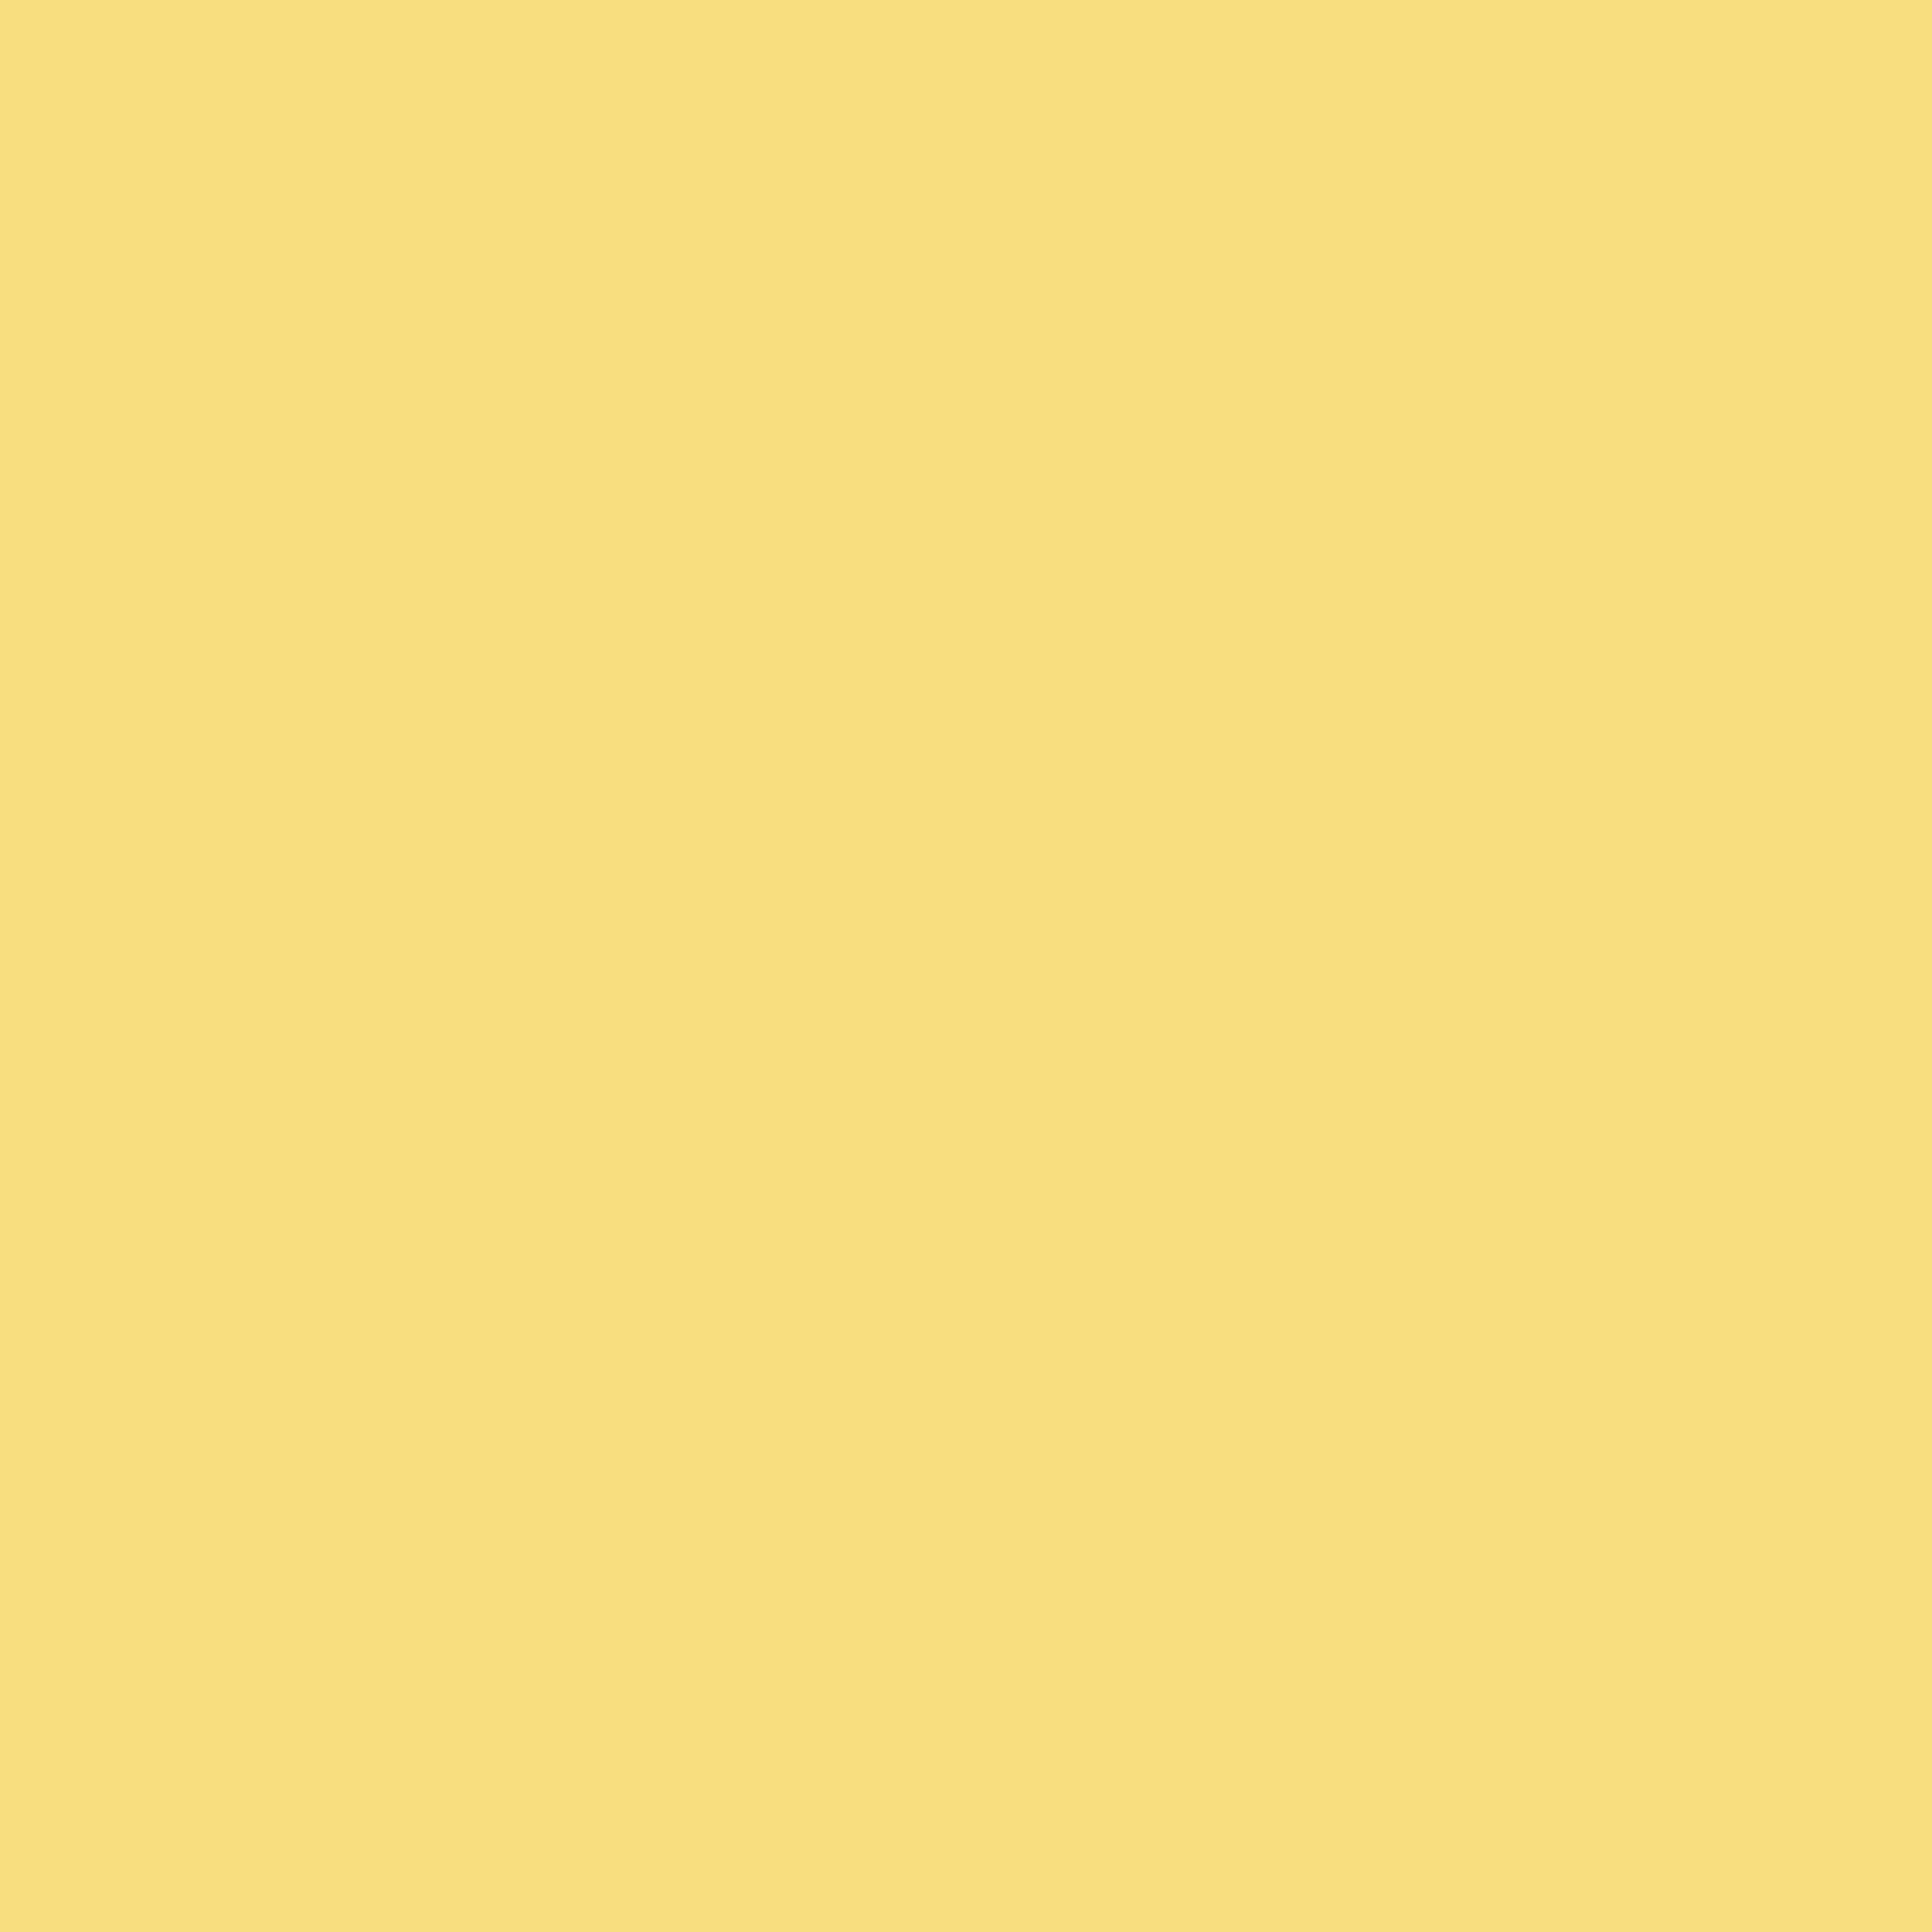 3600x3600 Jasmine Solid Color Background